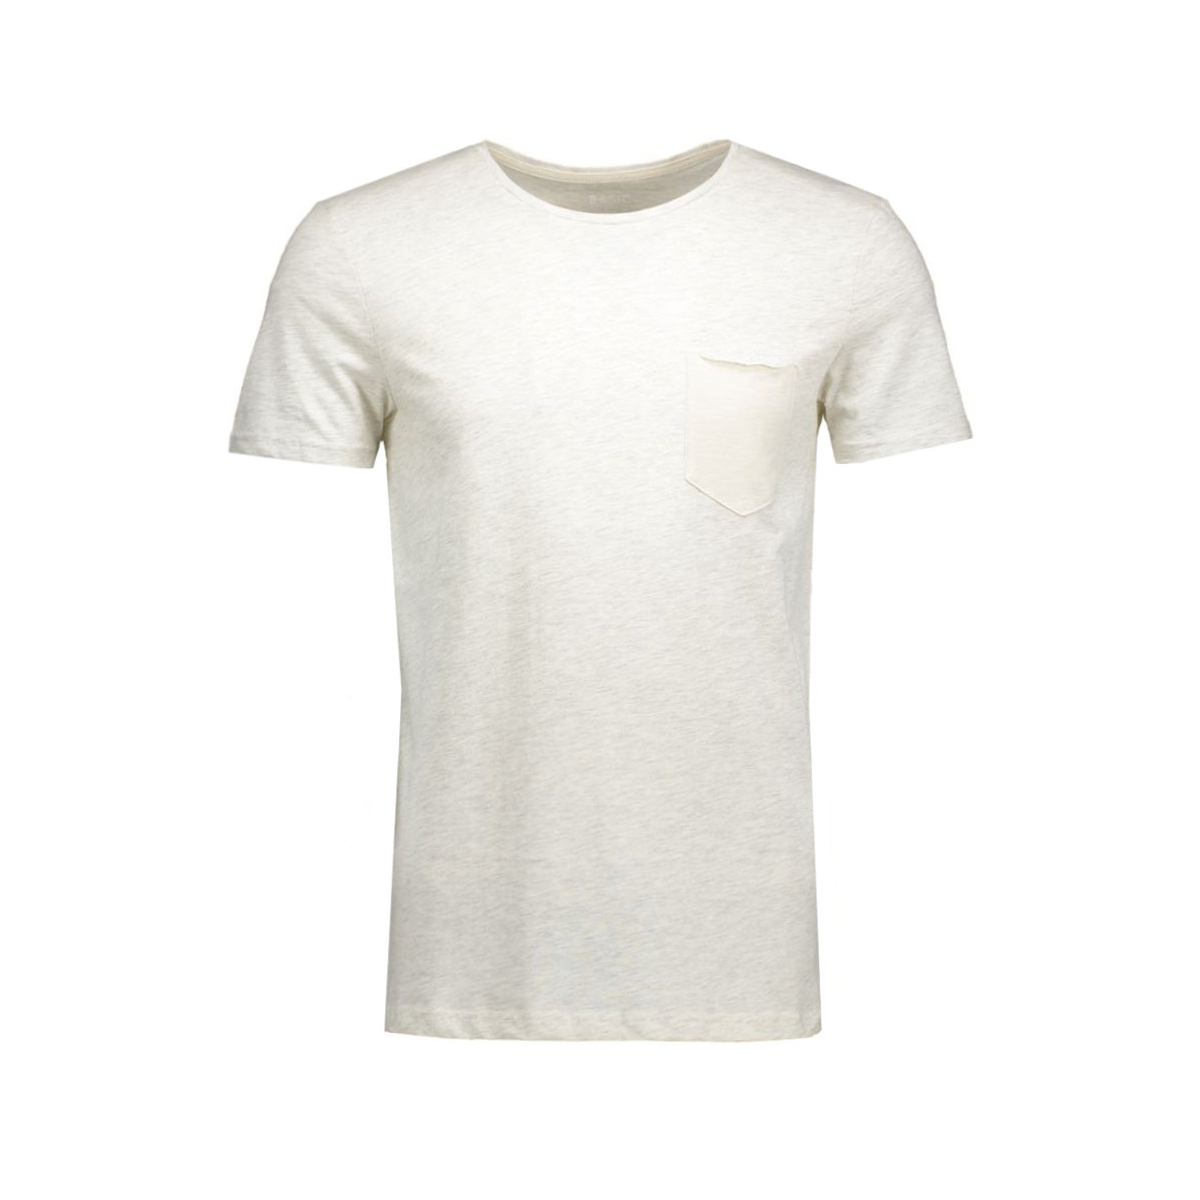 1035309.09.12 tom tailor t-shirt 2608